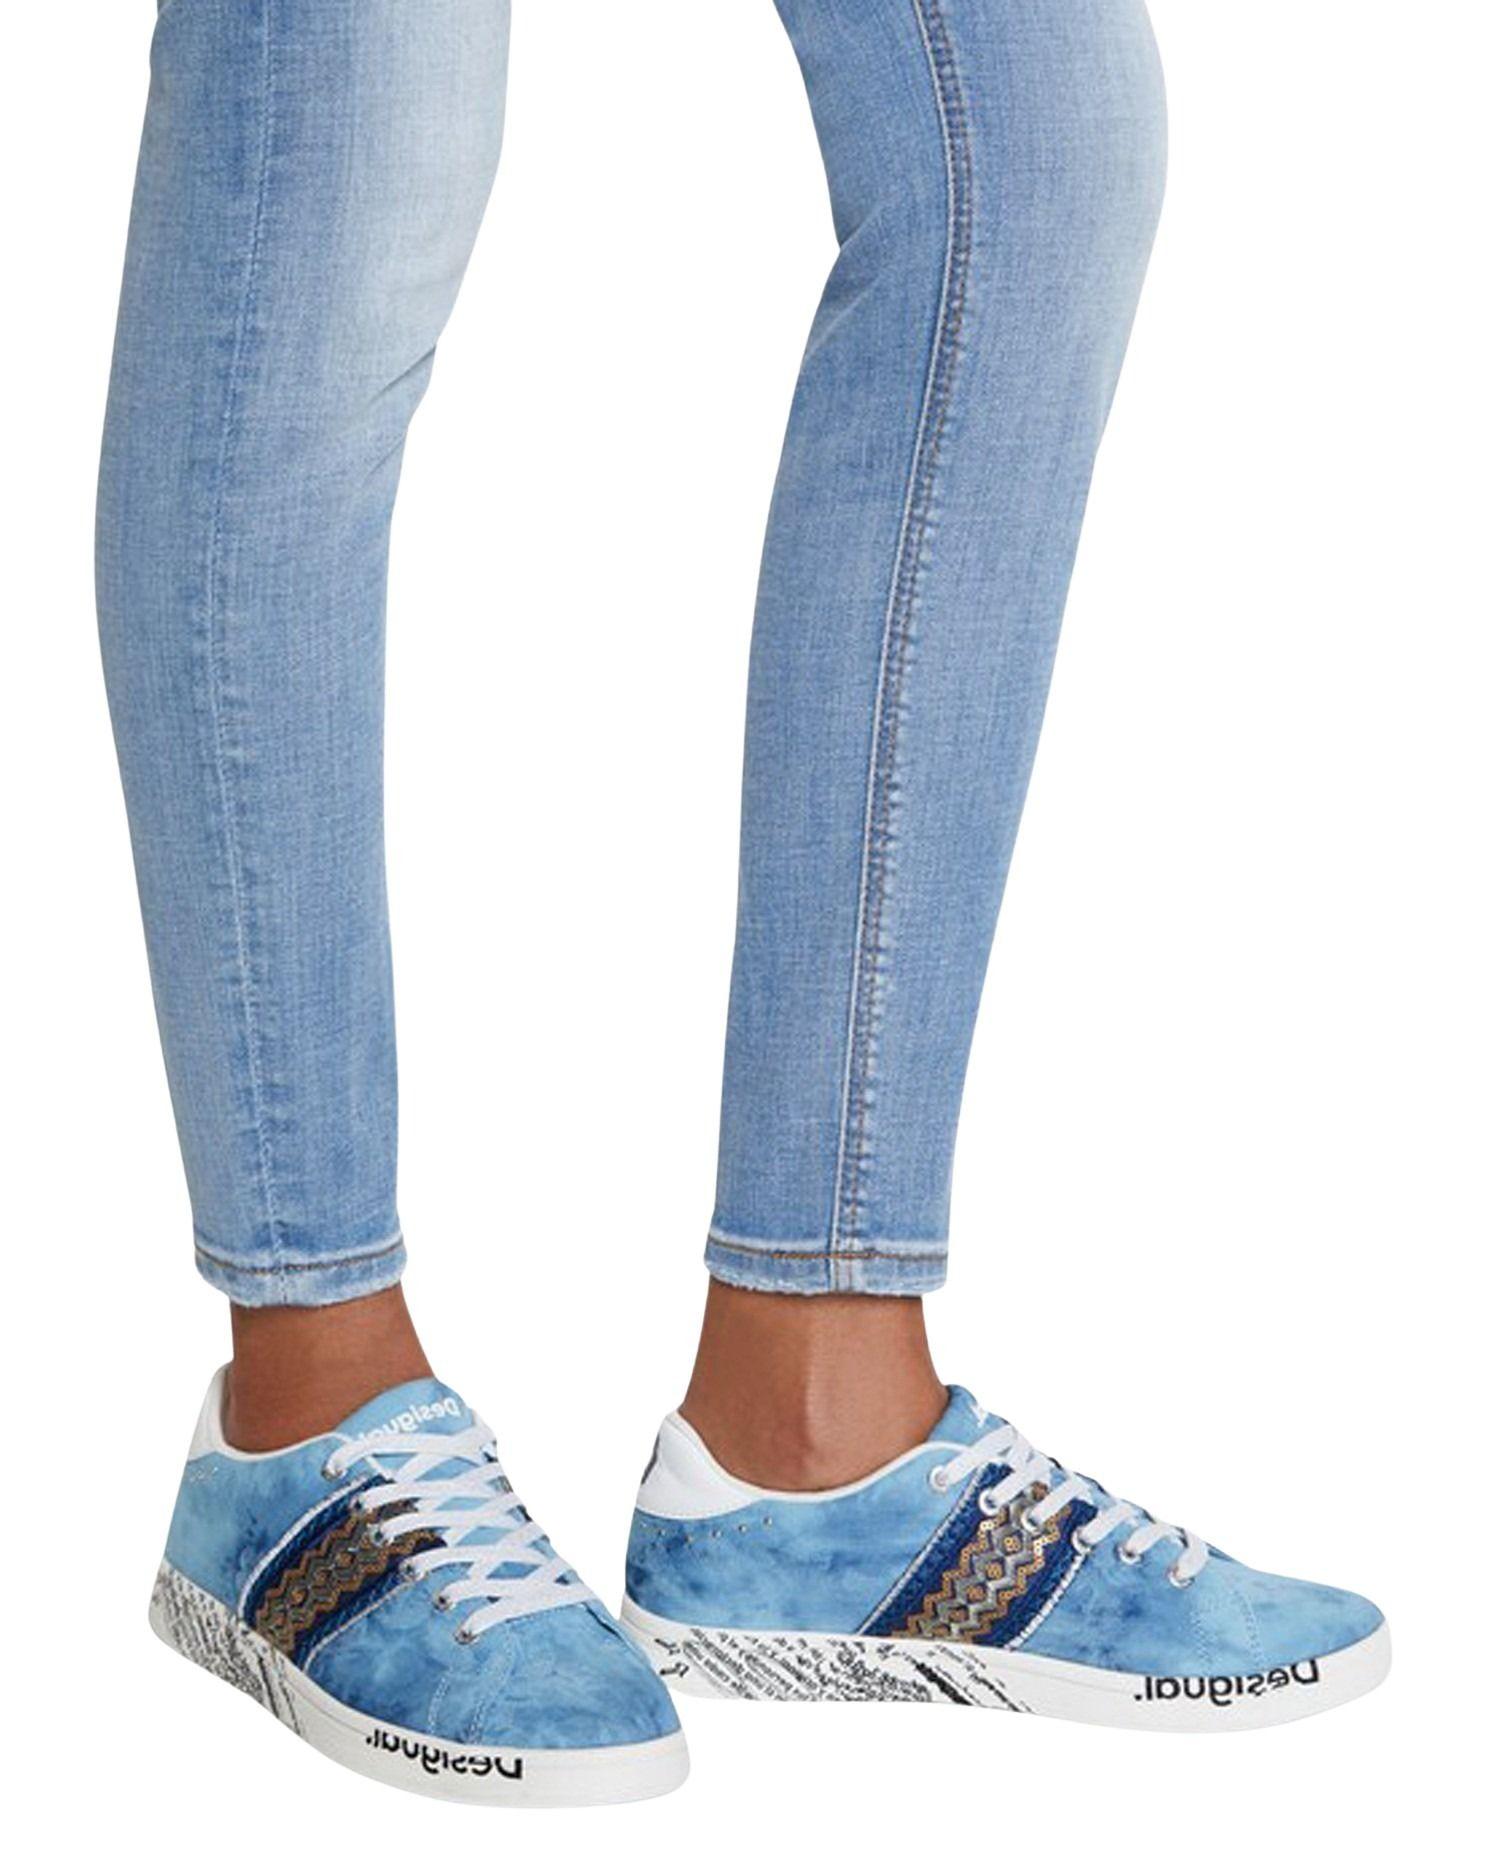 DESIGUAL Sneakers DESIGUAL WOMEN'S LIGHT BLUE COTTON SNEAKERS